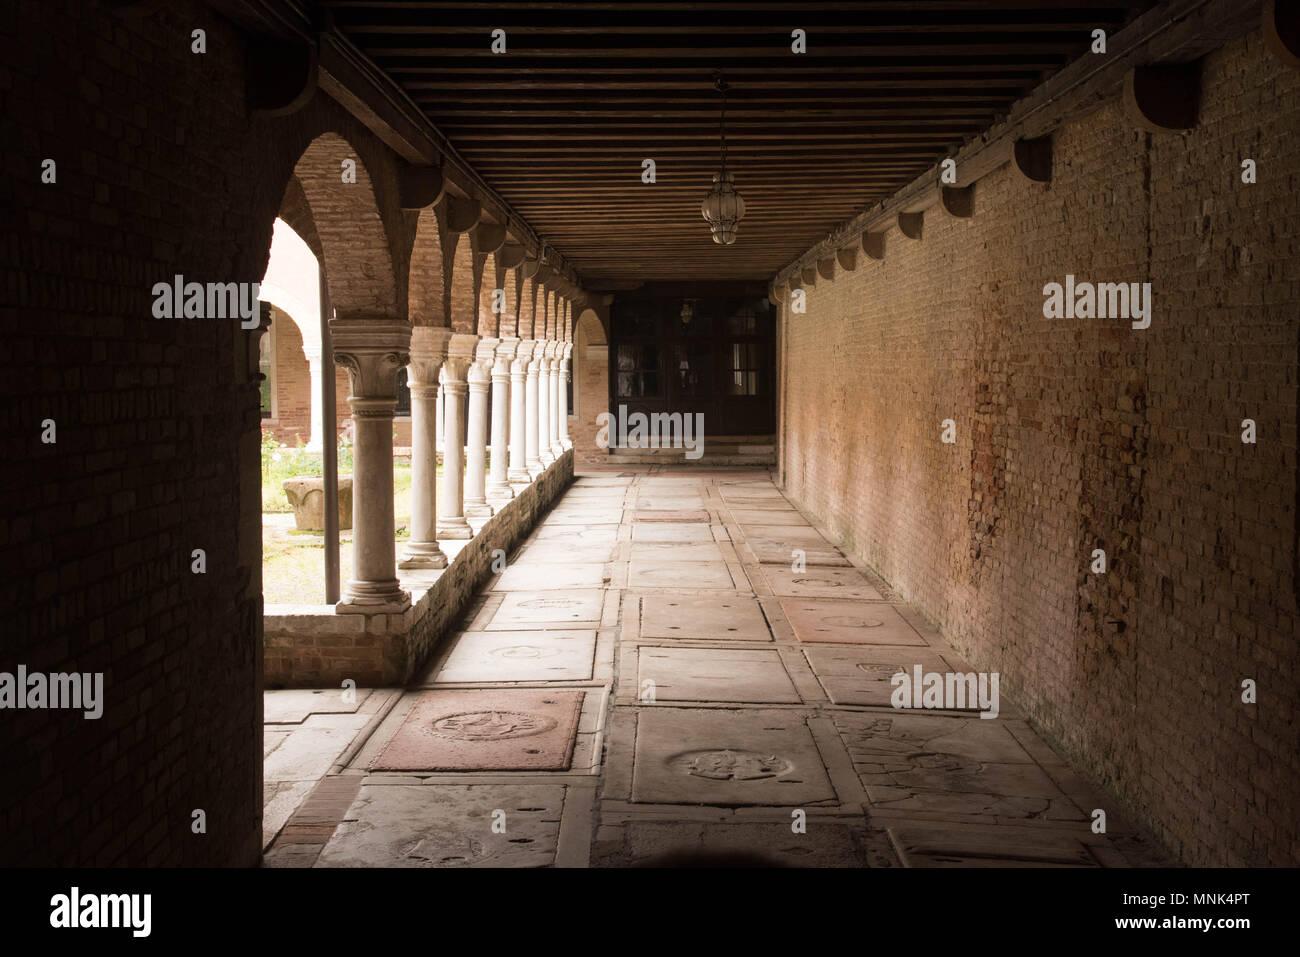 a cross corridor in a monastery in Venice - Stock Image